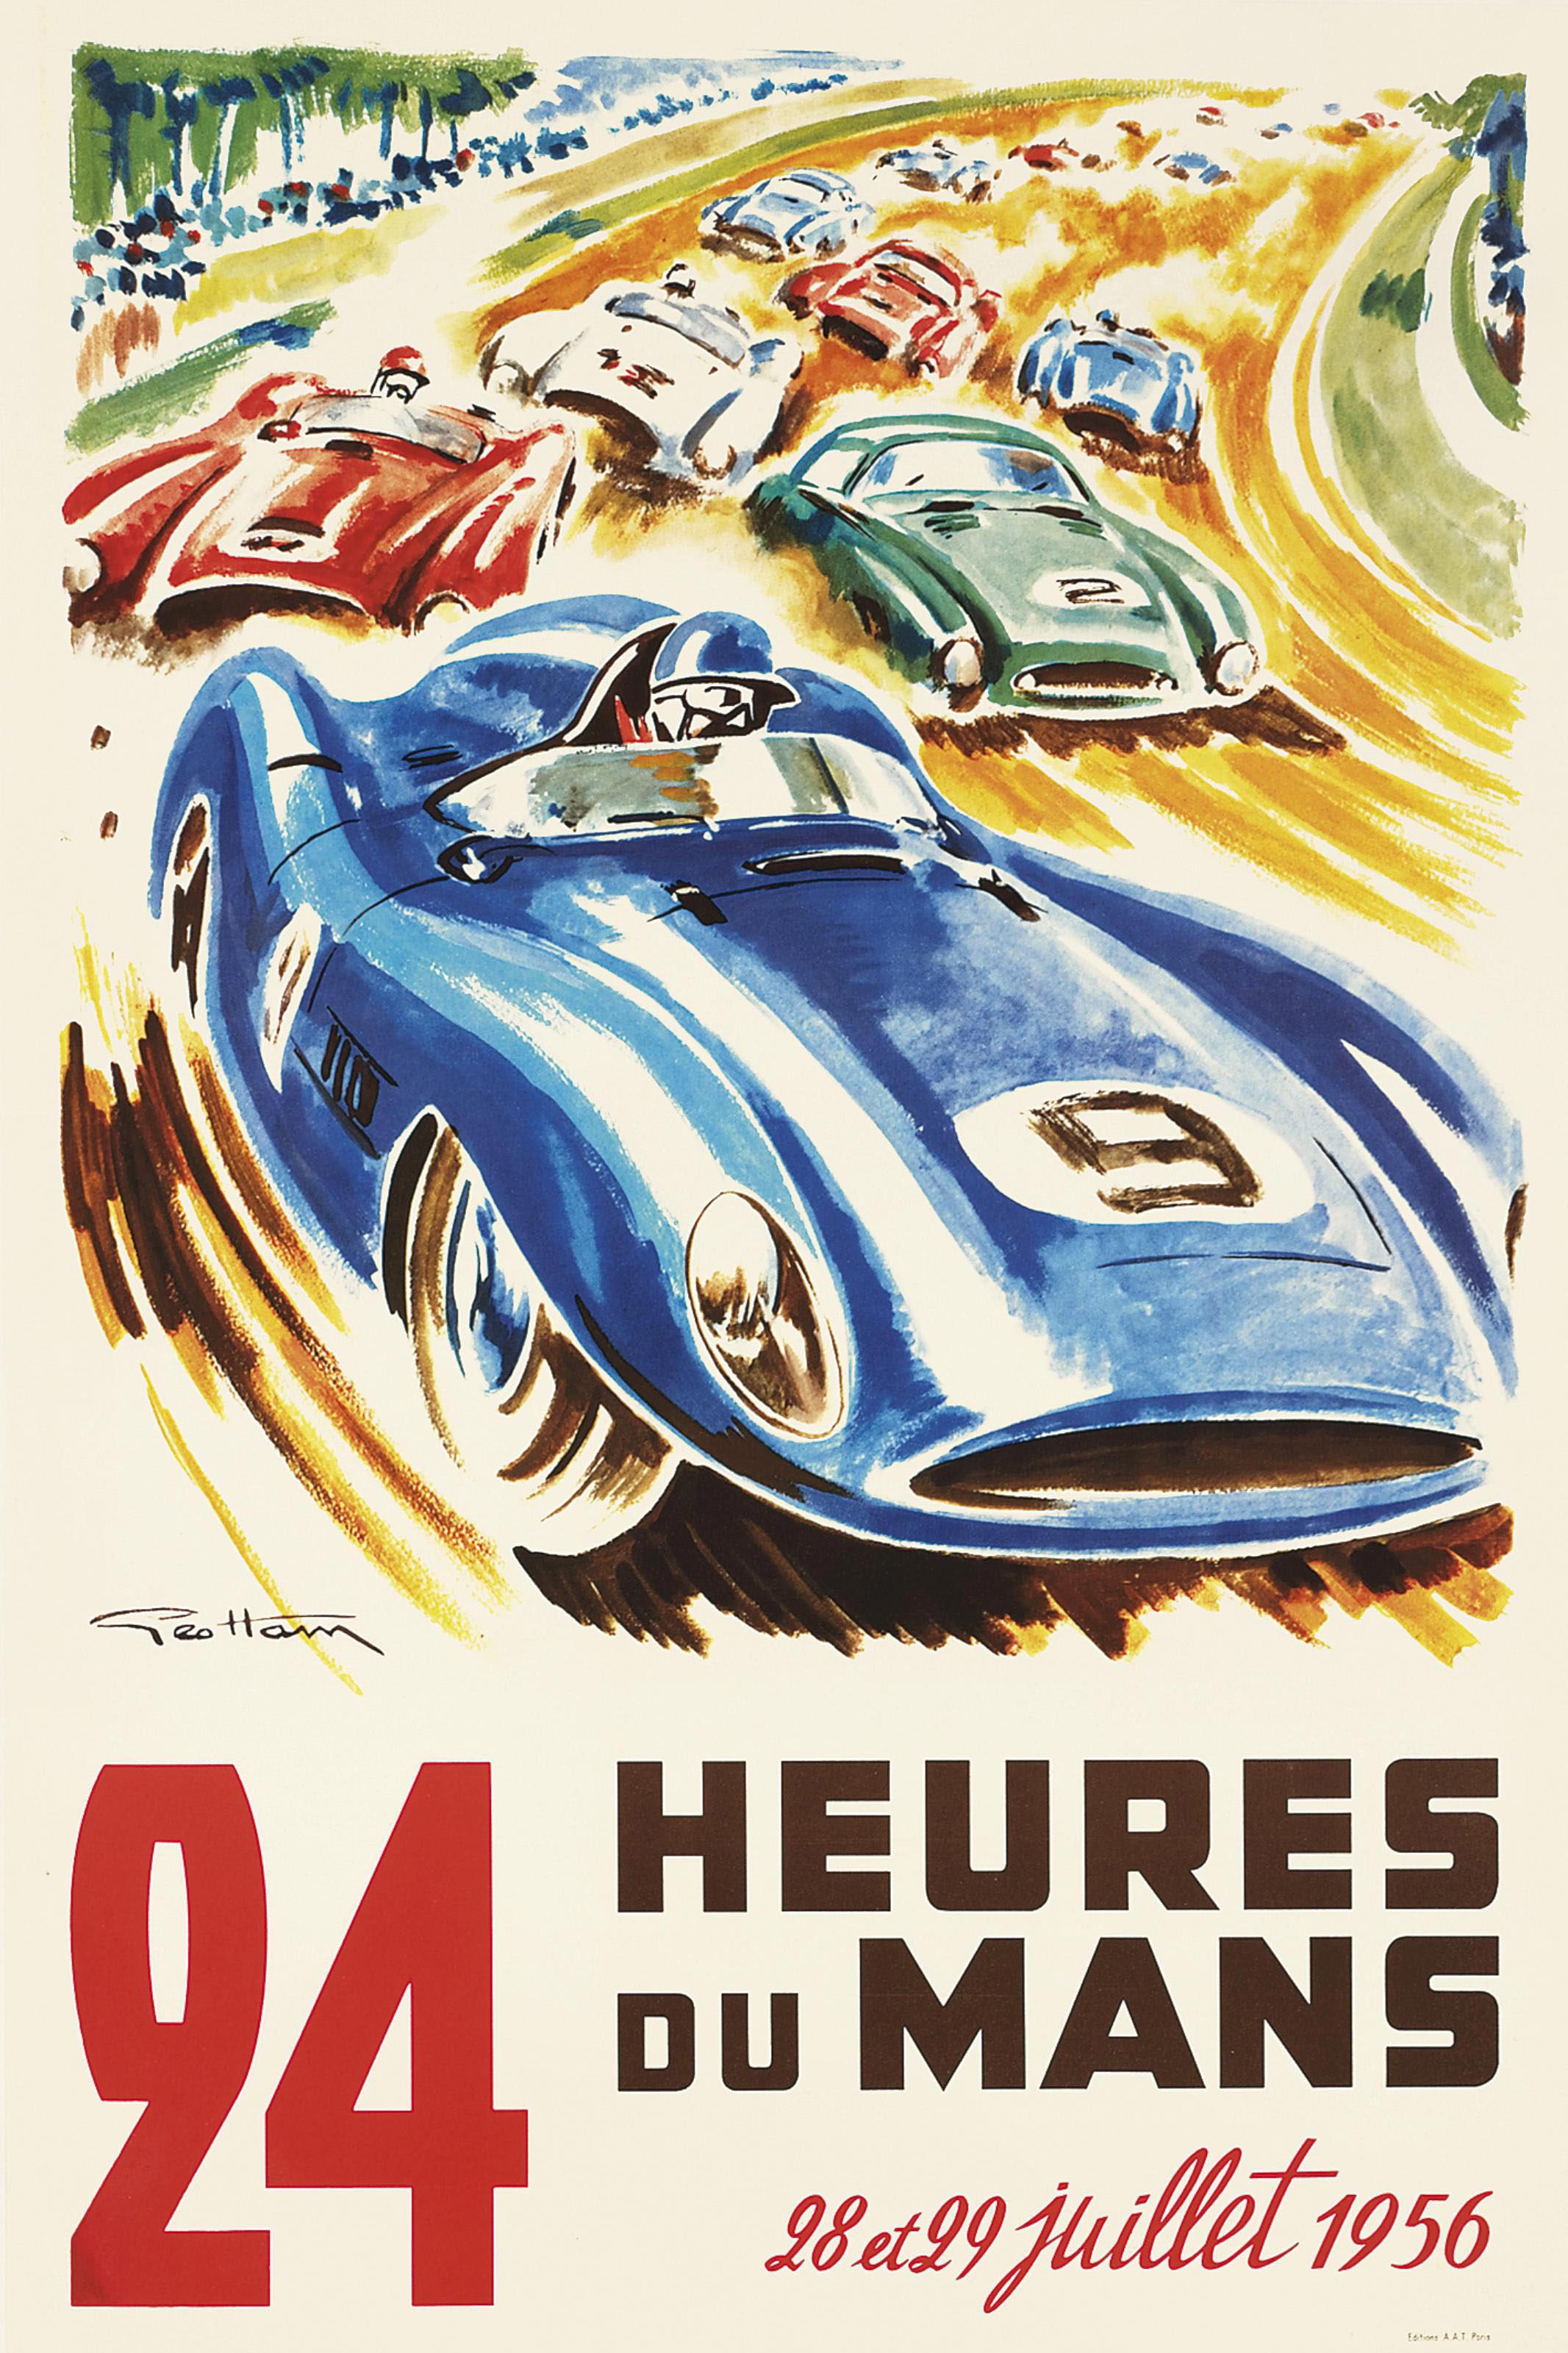 24 HEURES DU MANS, 1956